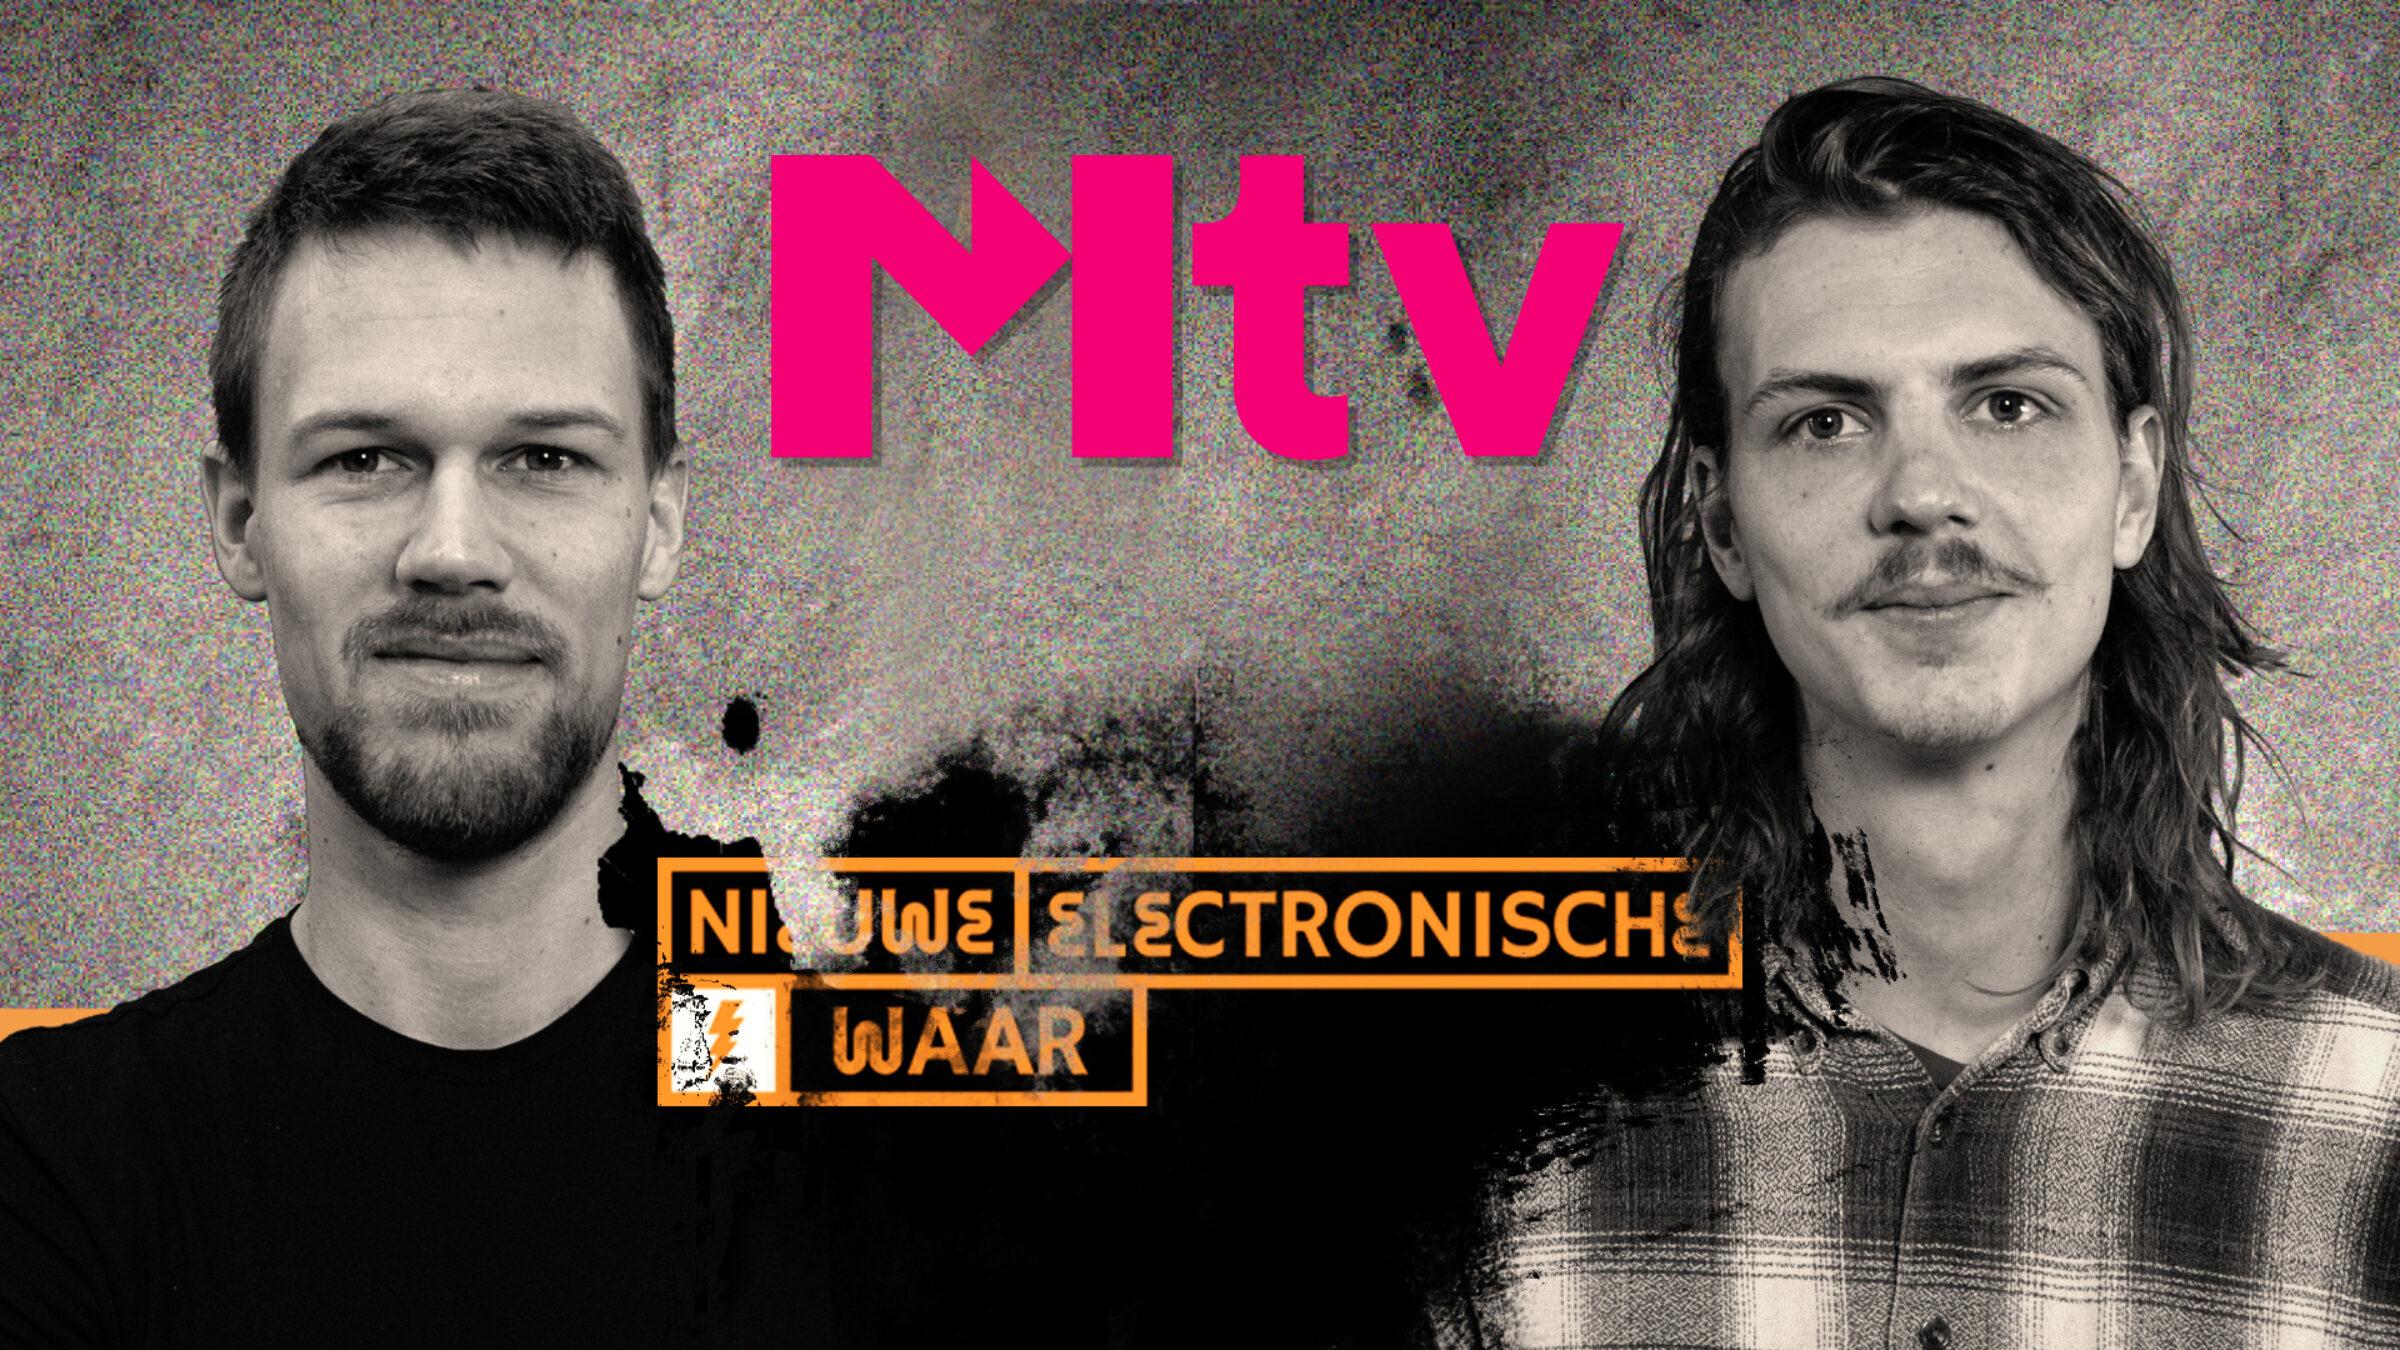 Metrotv new web